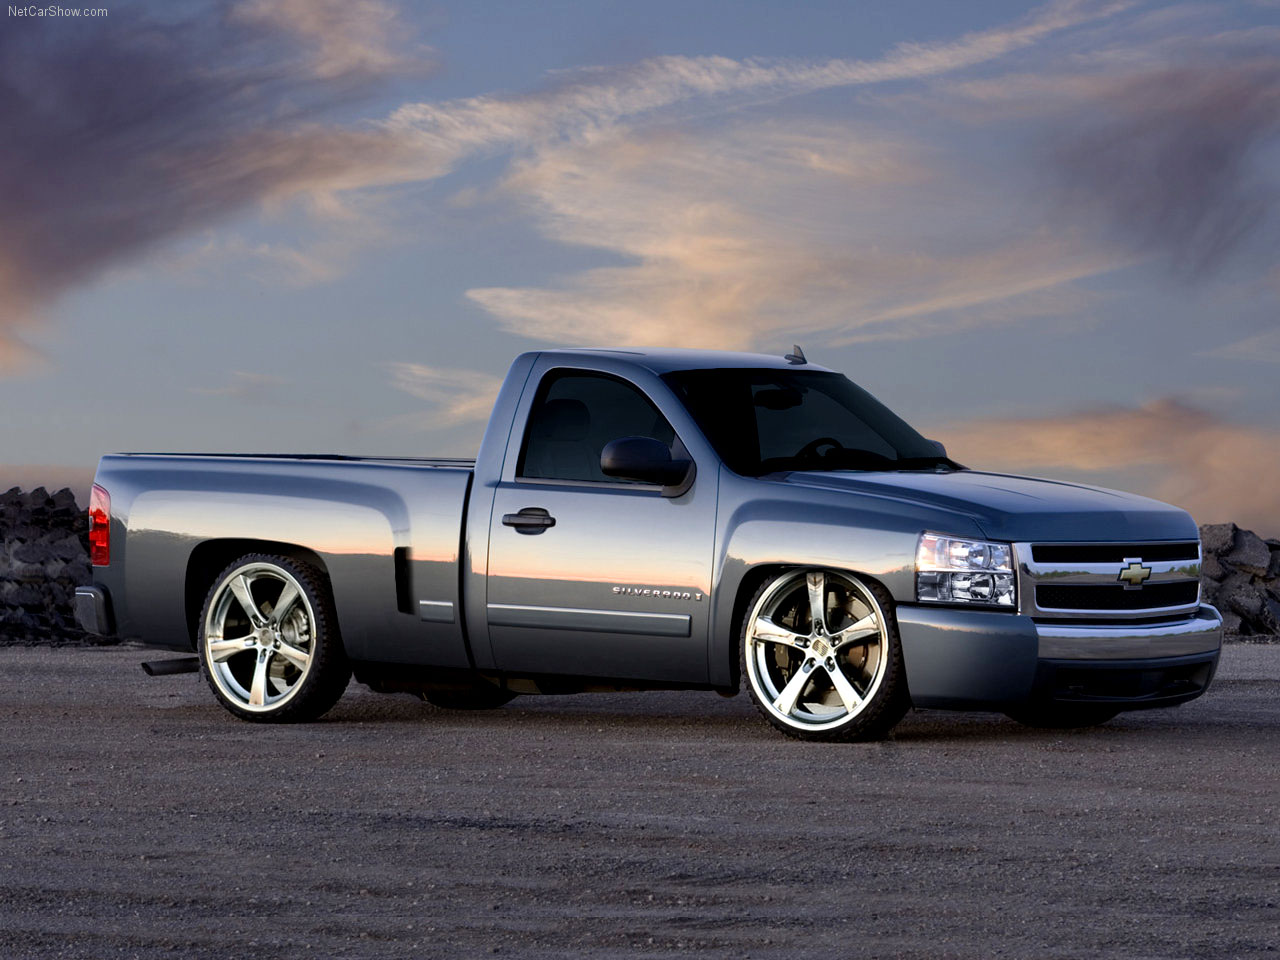 USA Pick-up Trucks • Toon onderwerp - The random picture ...